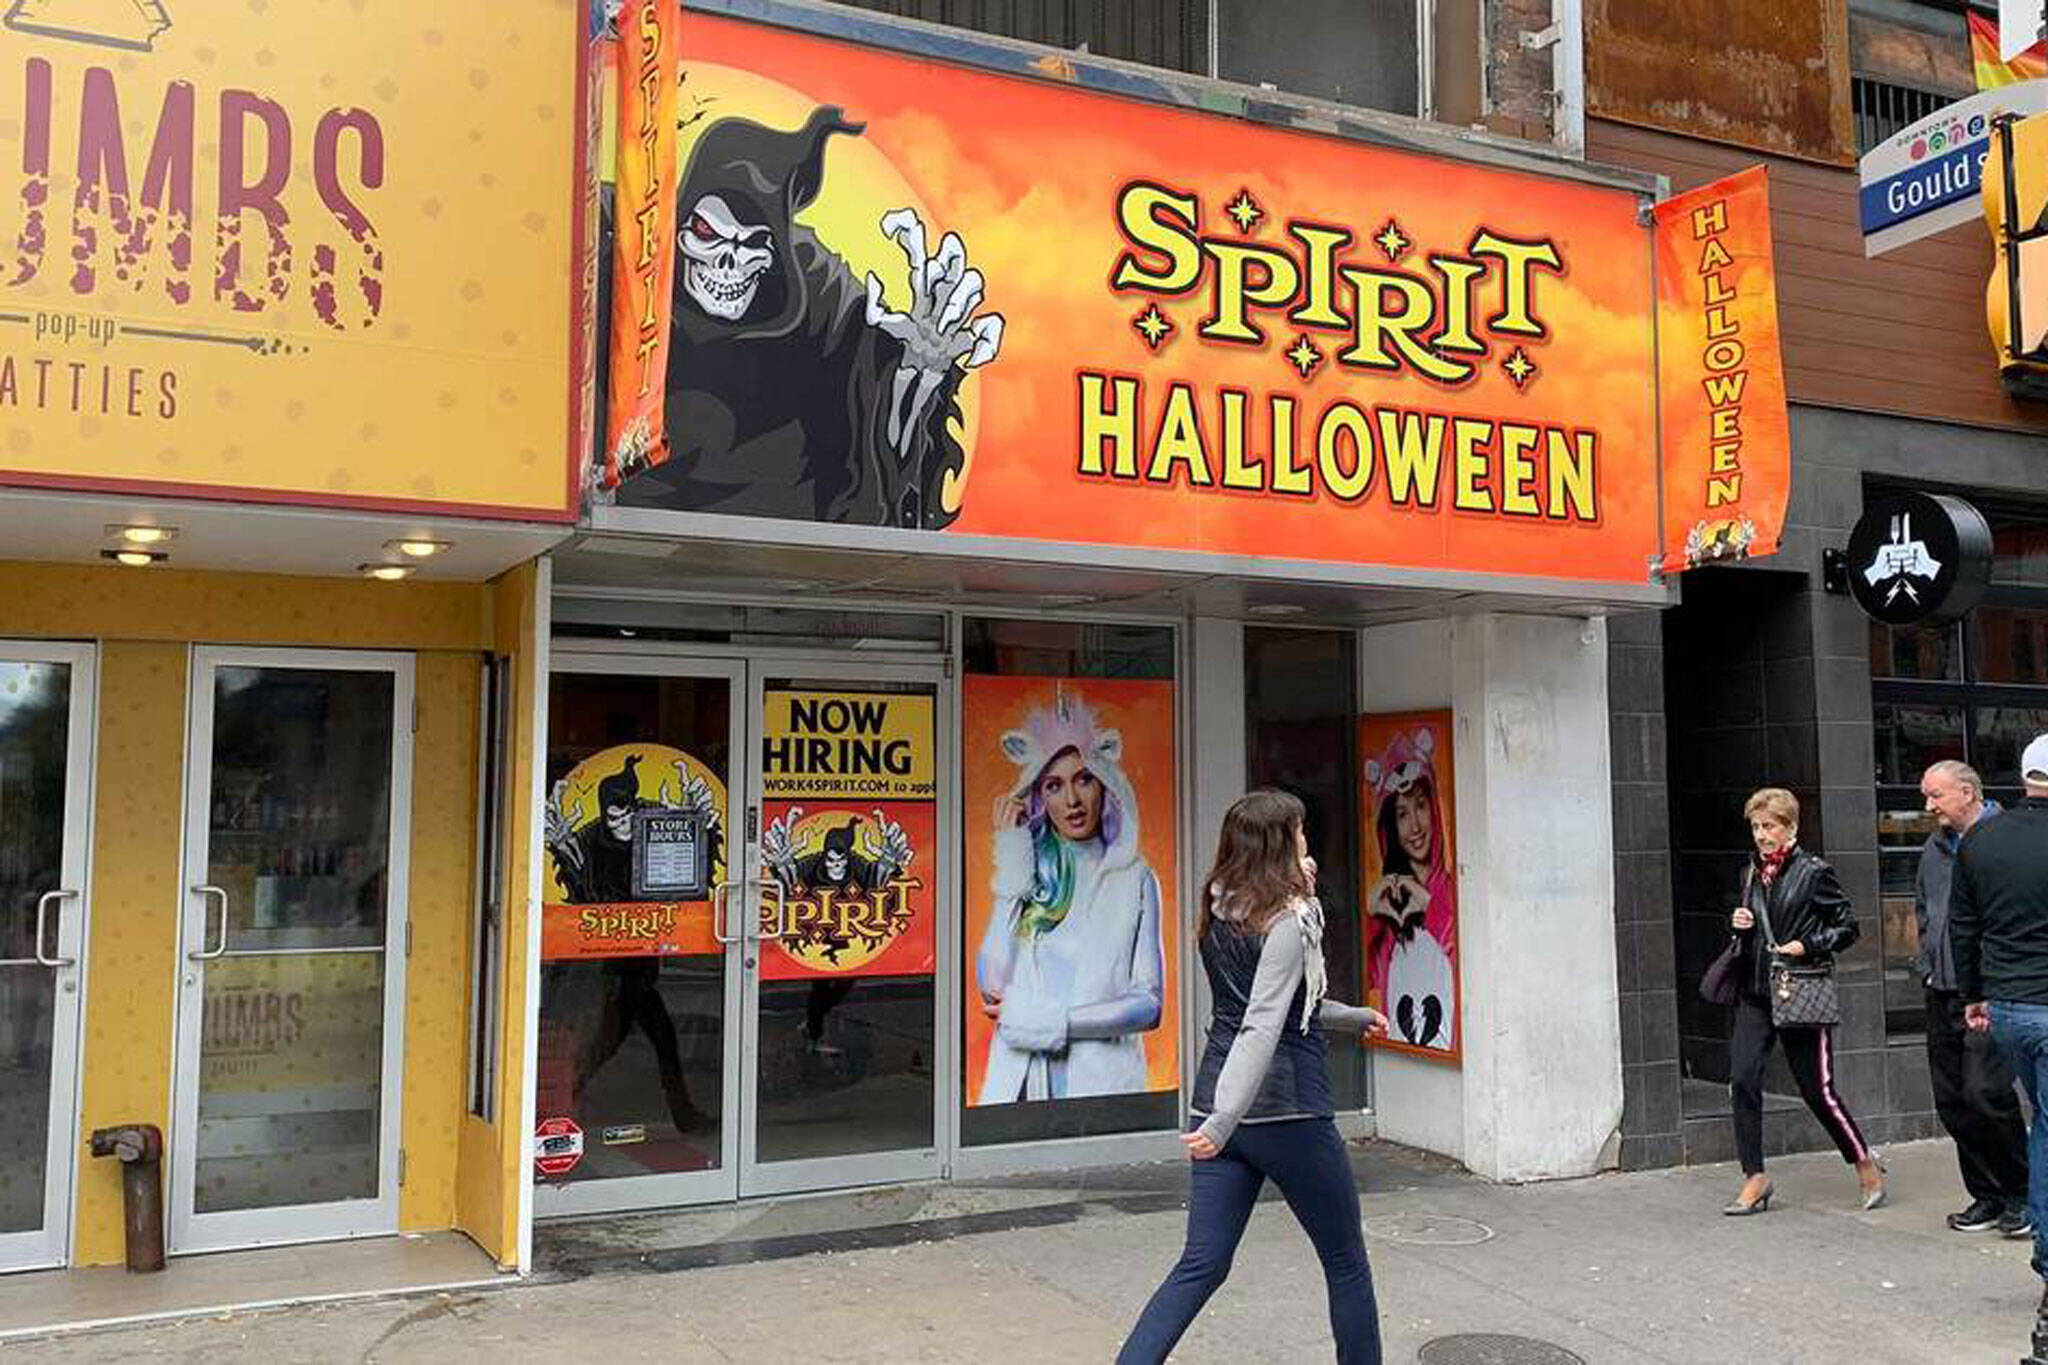 spirit halloween toronto